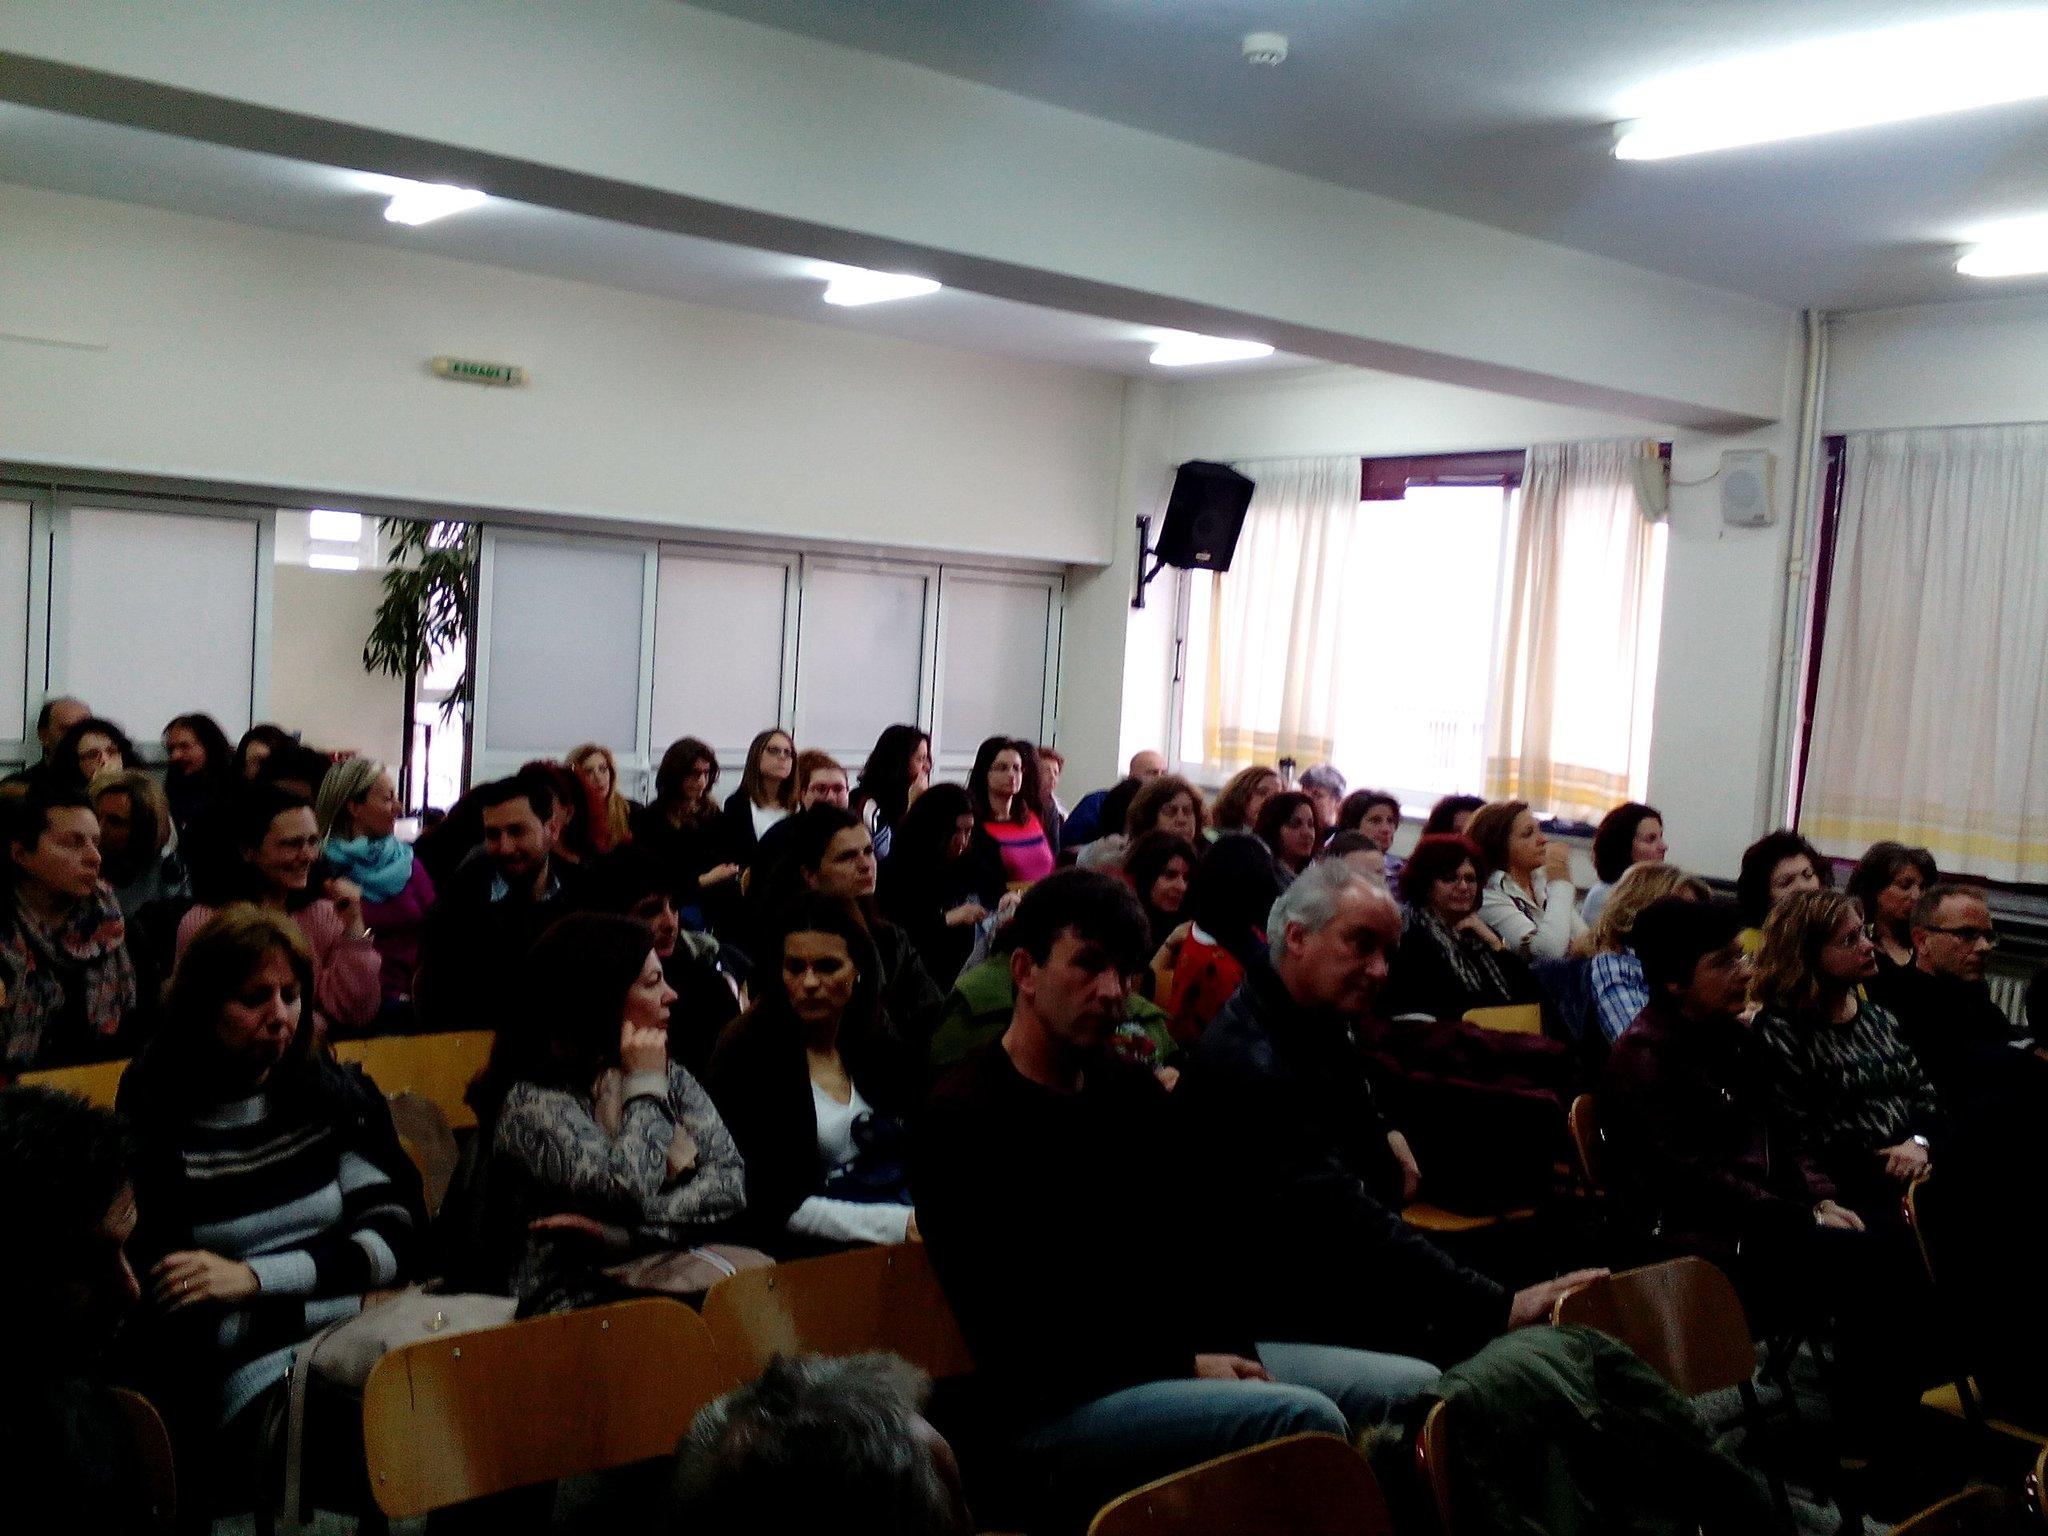 #ALLSTEMScientix teachers are ready for learning how use @scientix_eu for #innovation #ict tools #STEMeducation @stemalliance_eu #motivation https://t.co/I76XeBVVKk